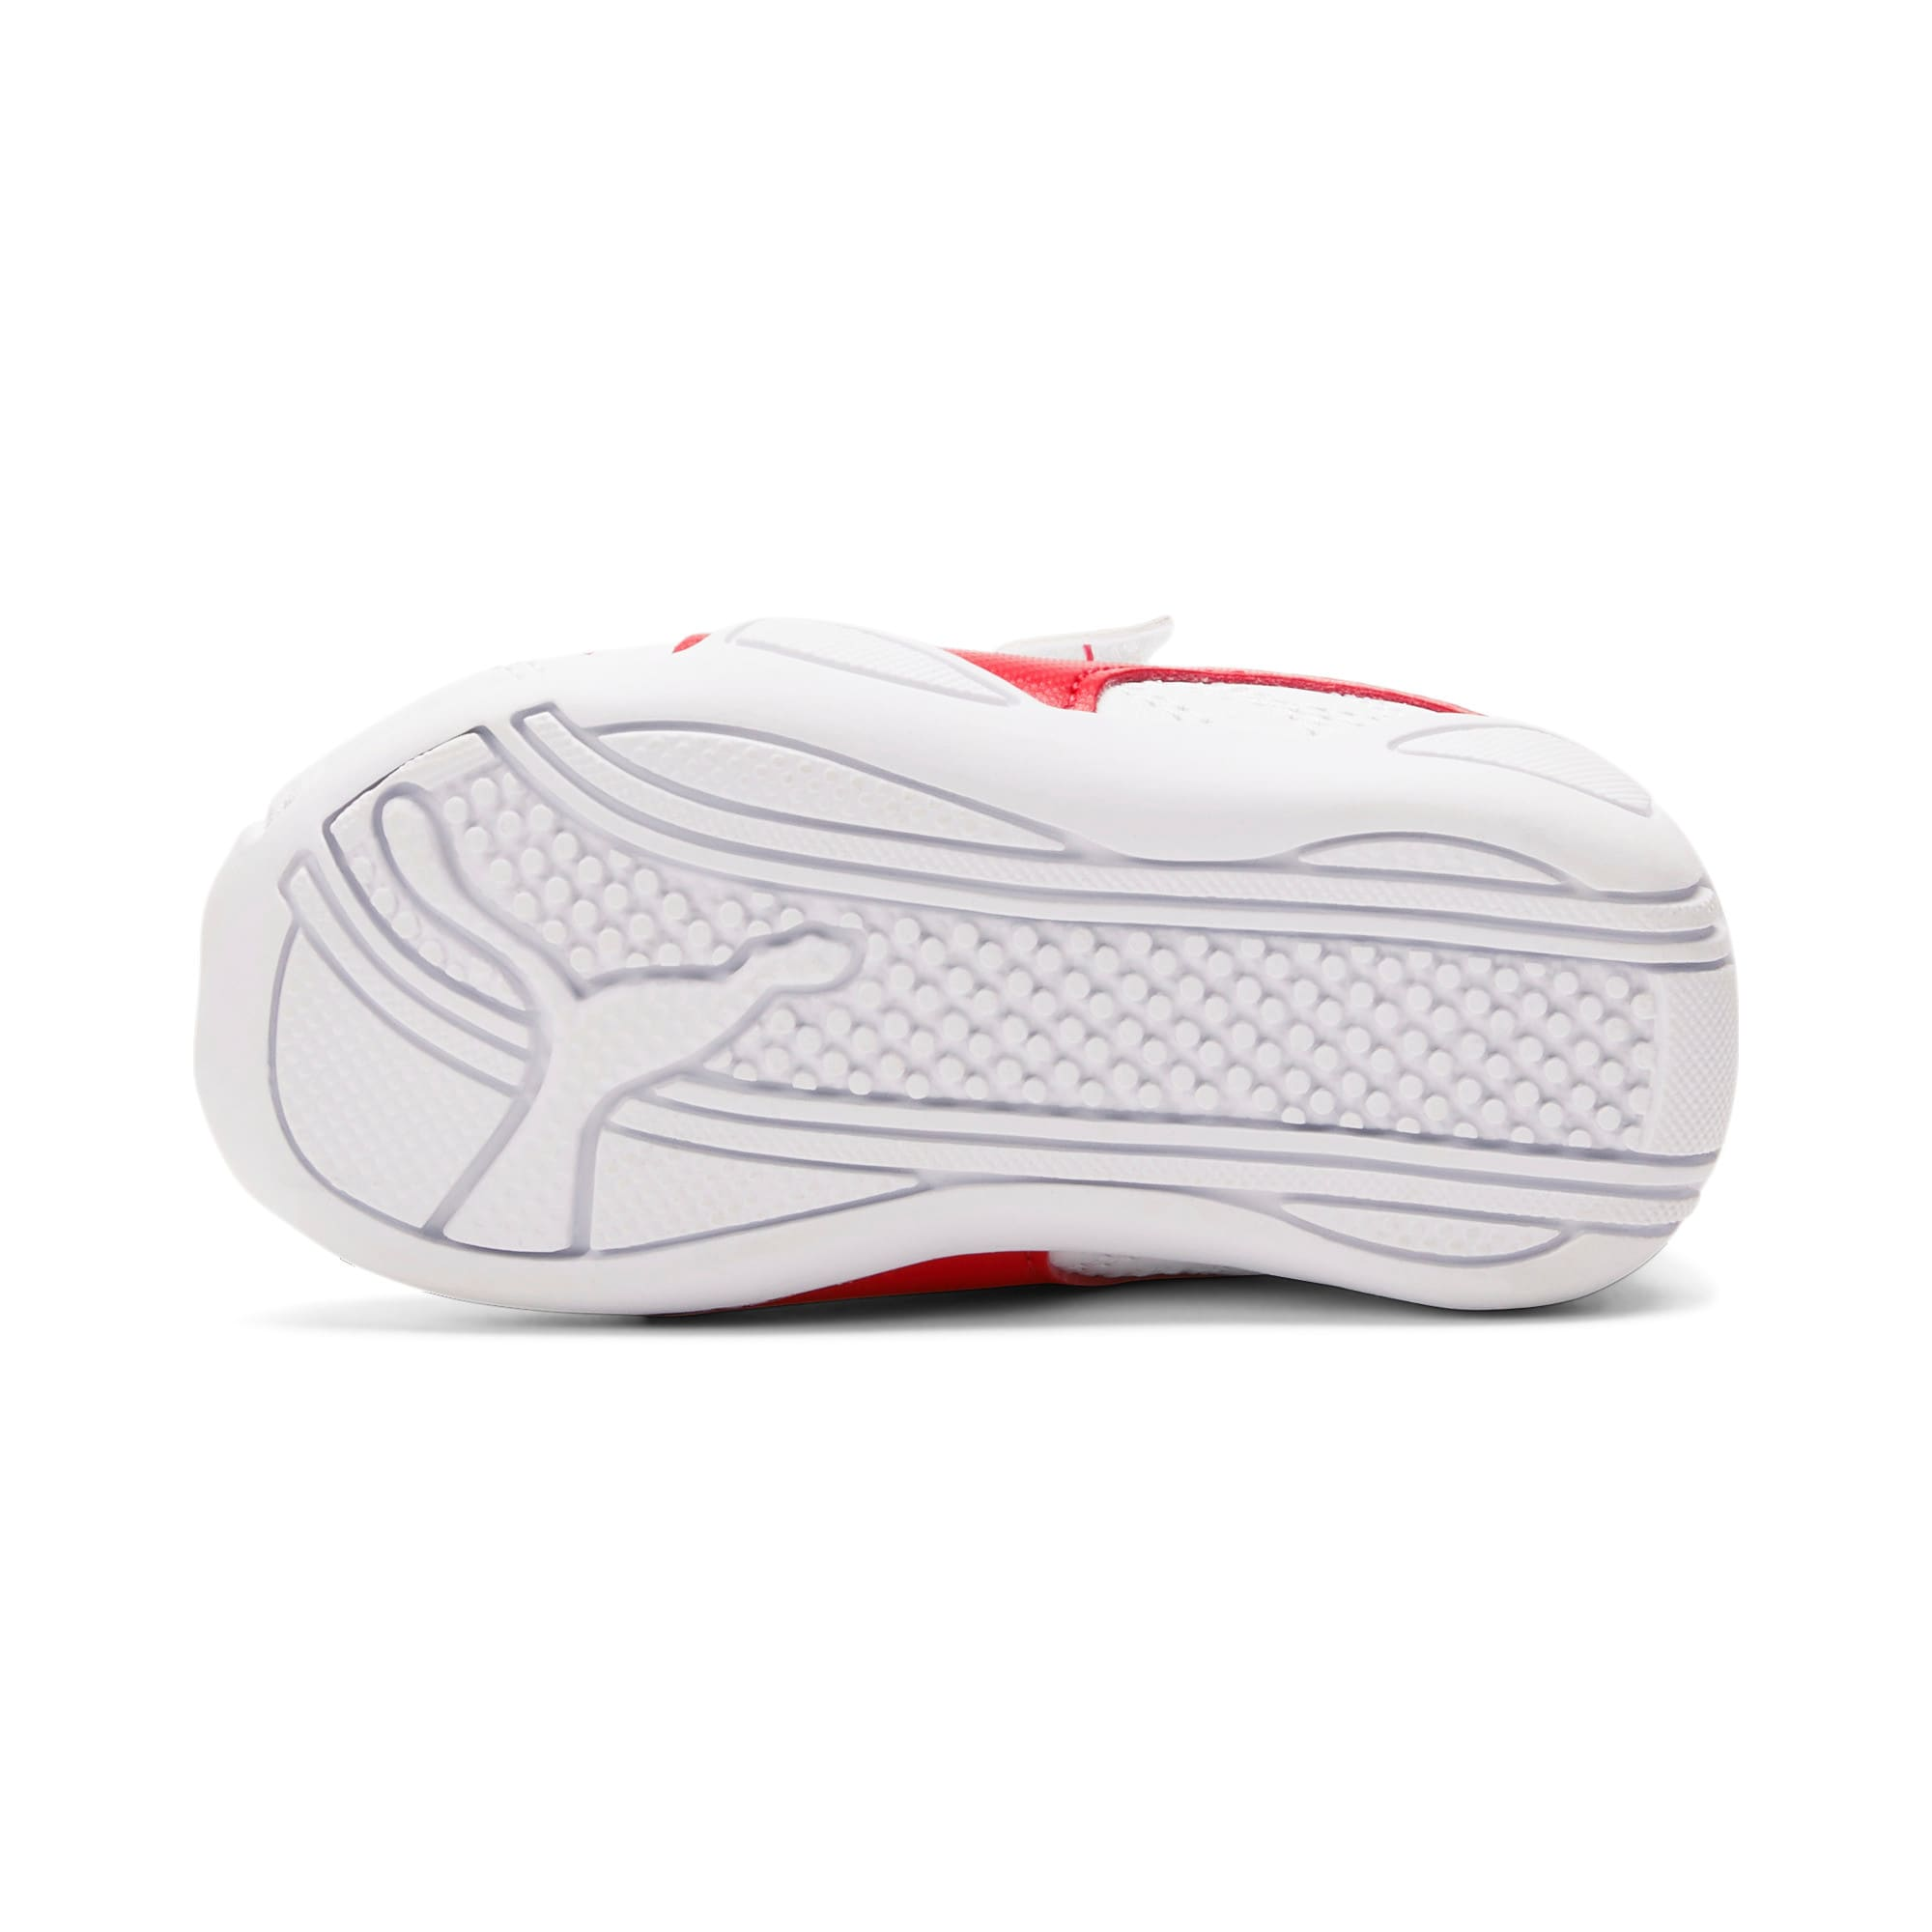 Miniatura 3 de Zapatos Tune Cat3AC para bebés, Puma White-Flame Scarlet, mediano